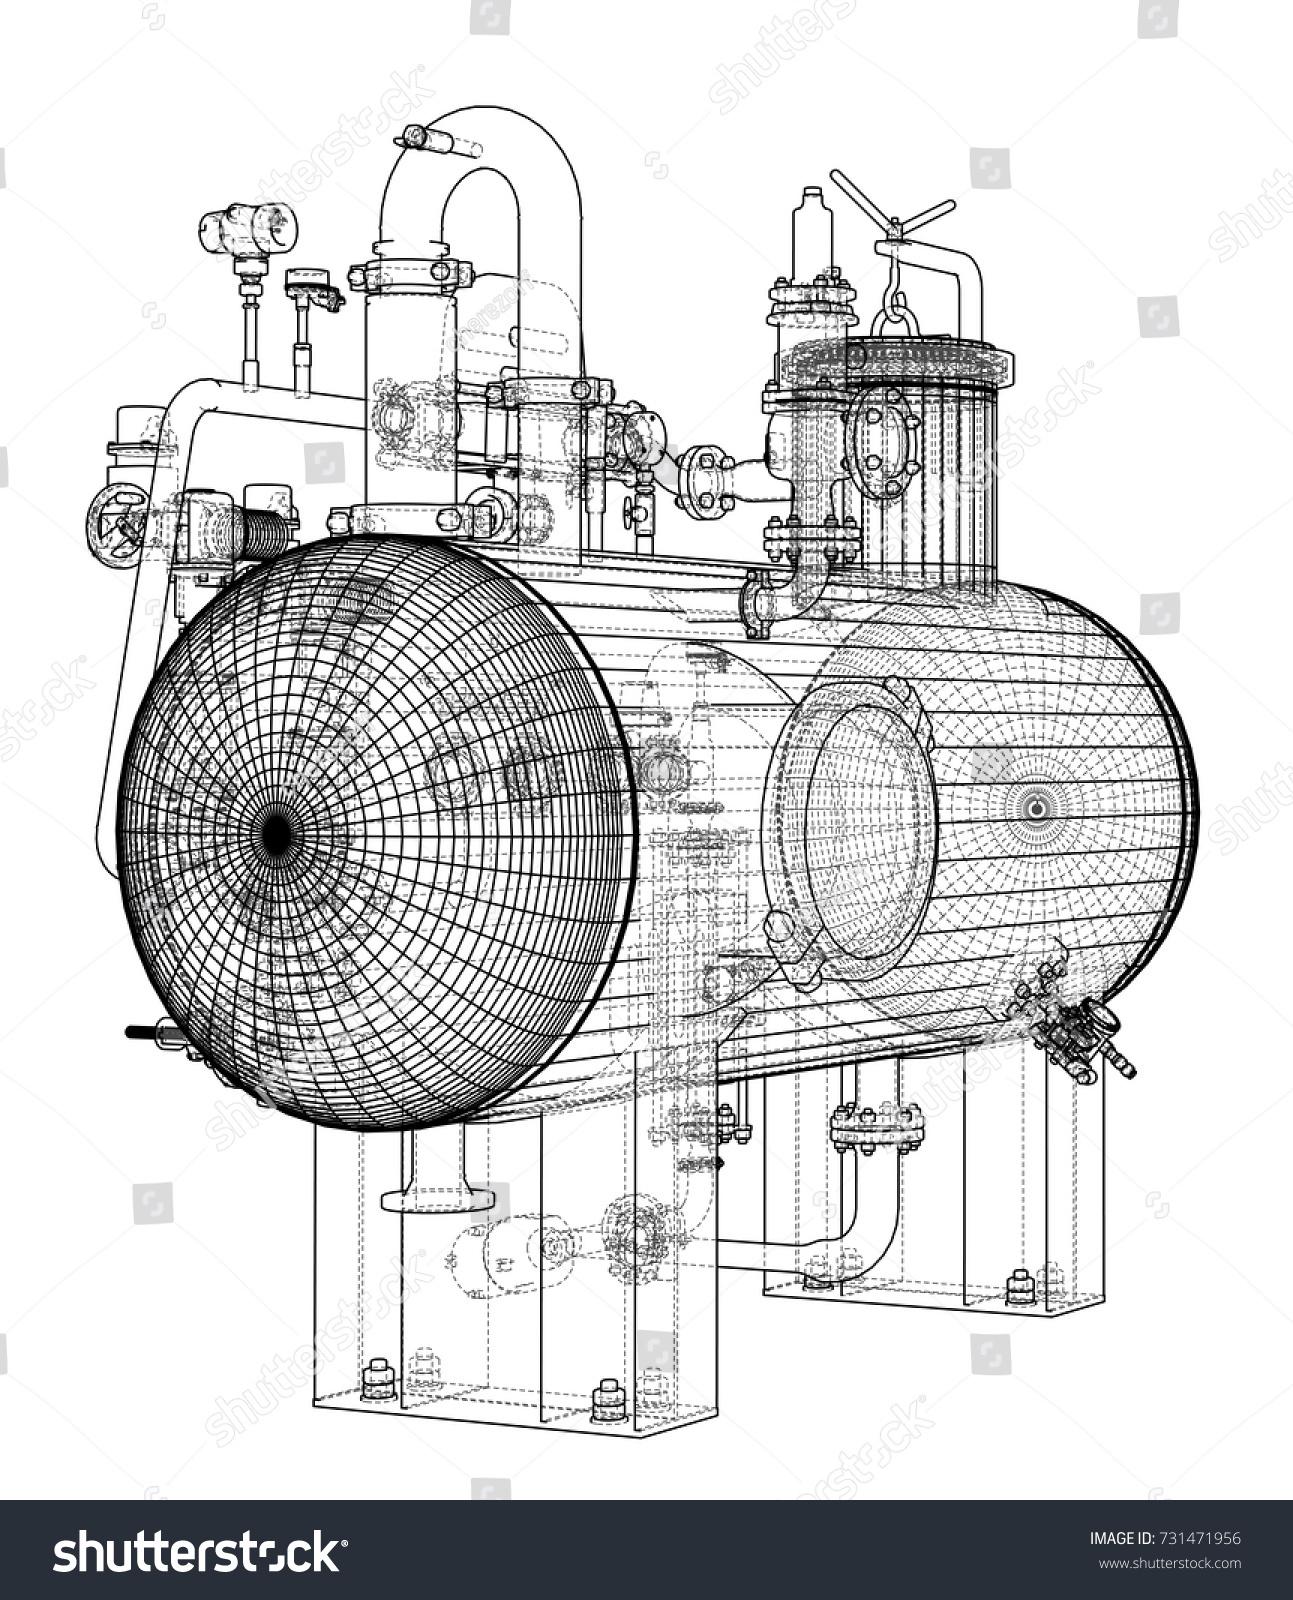 Sketch Industrial Equipment EPS 10 Vector Stock Photo (Photo, Vector ...